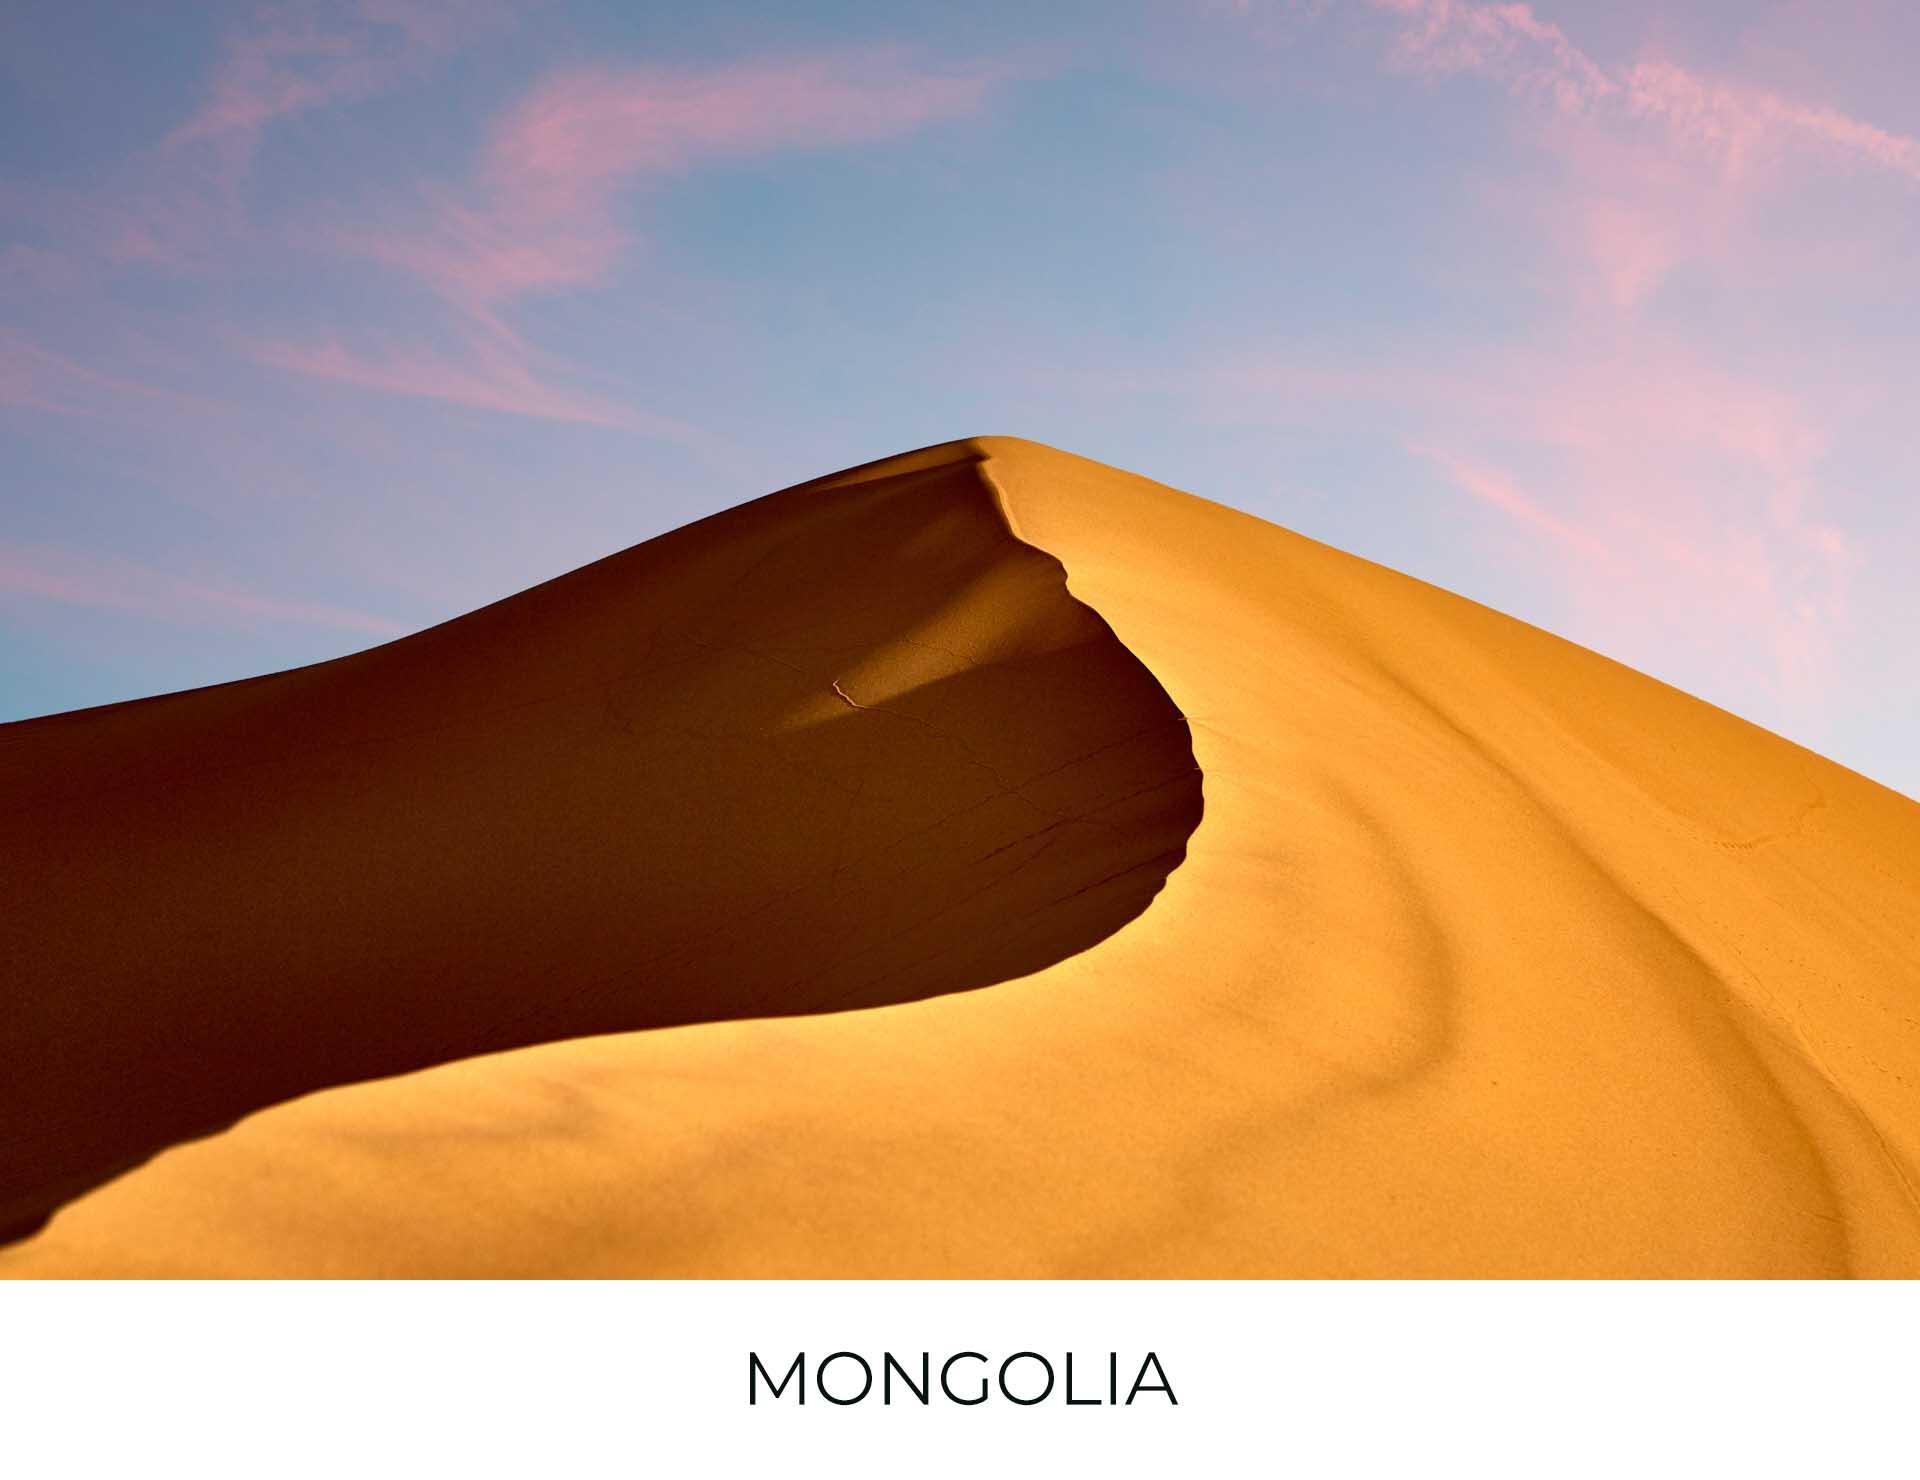 Mongolia mini